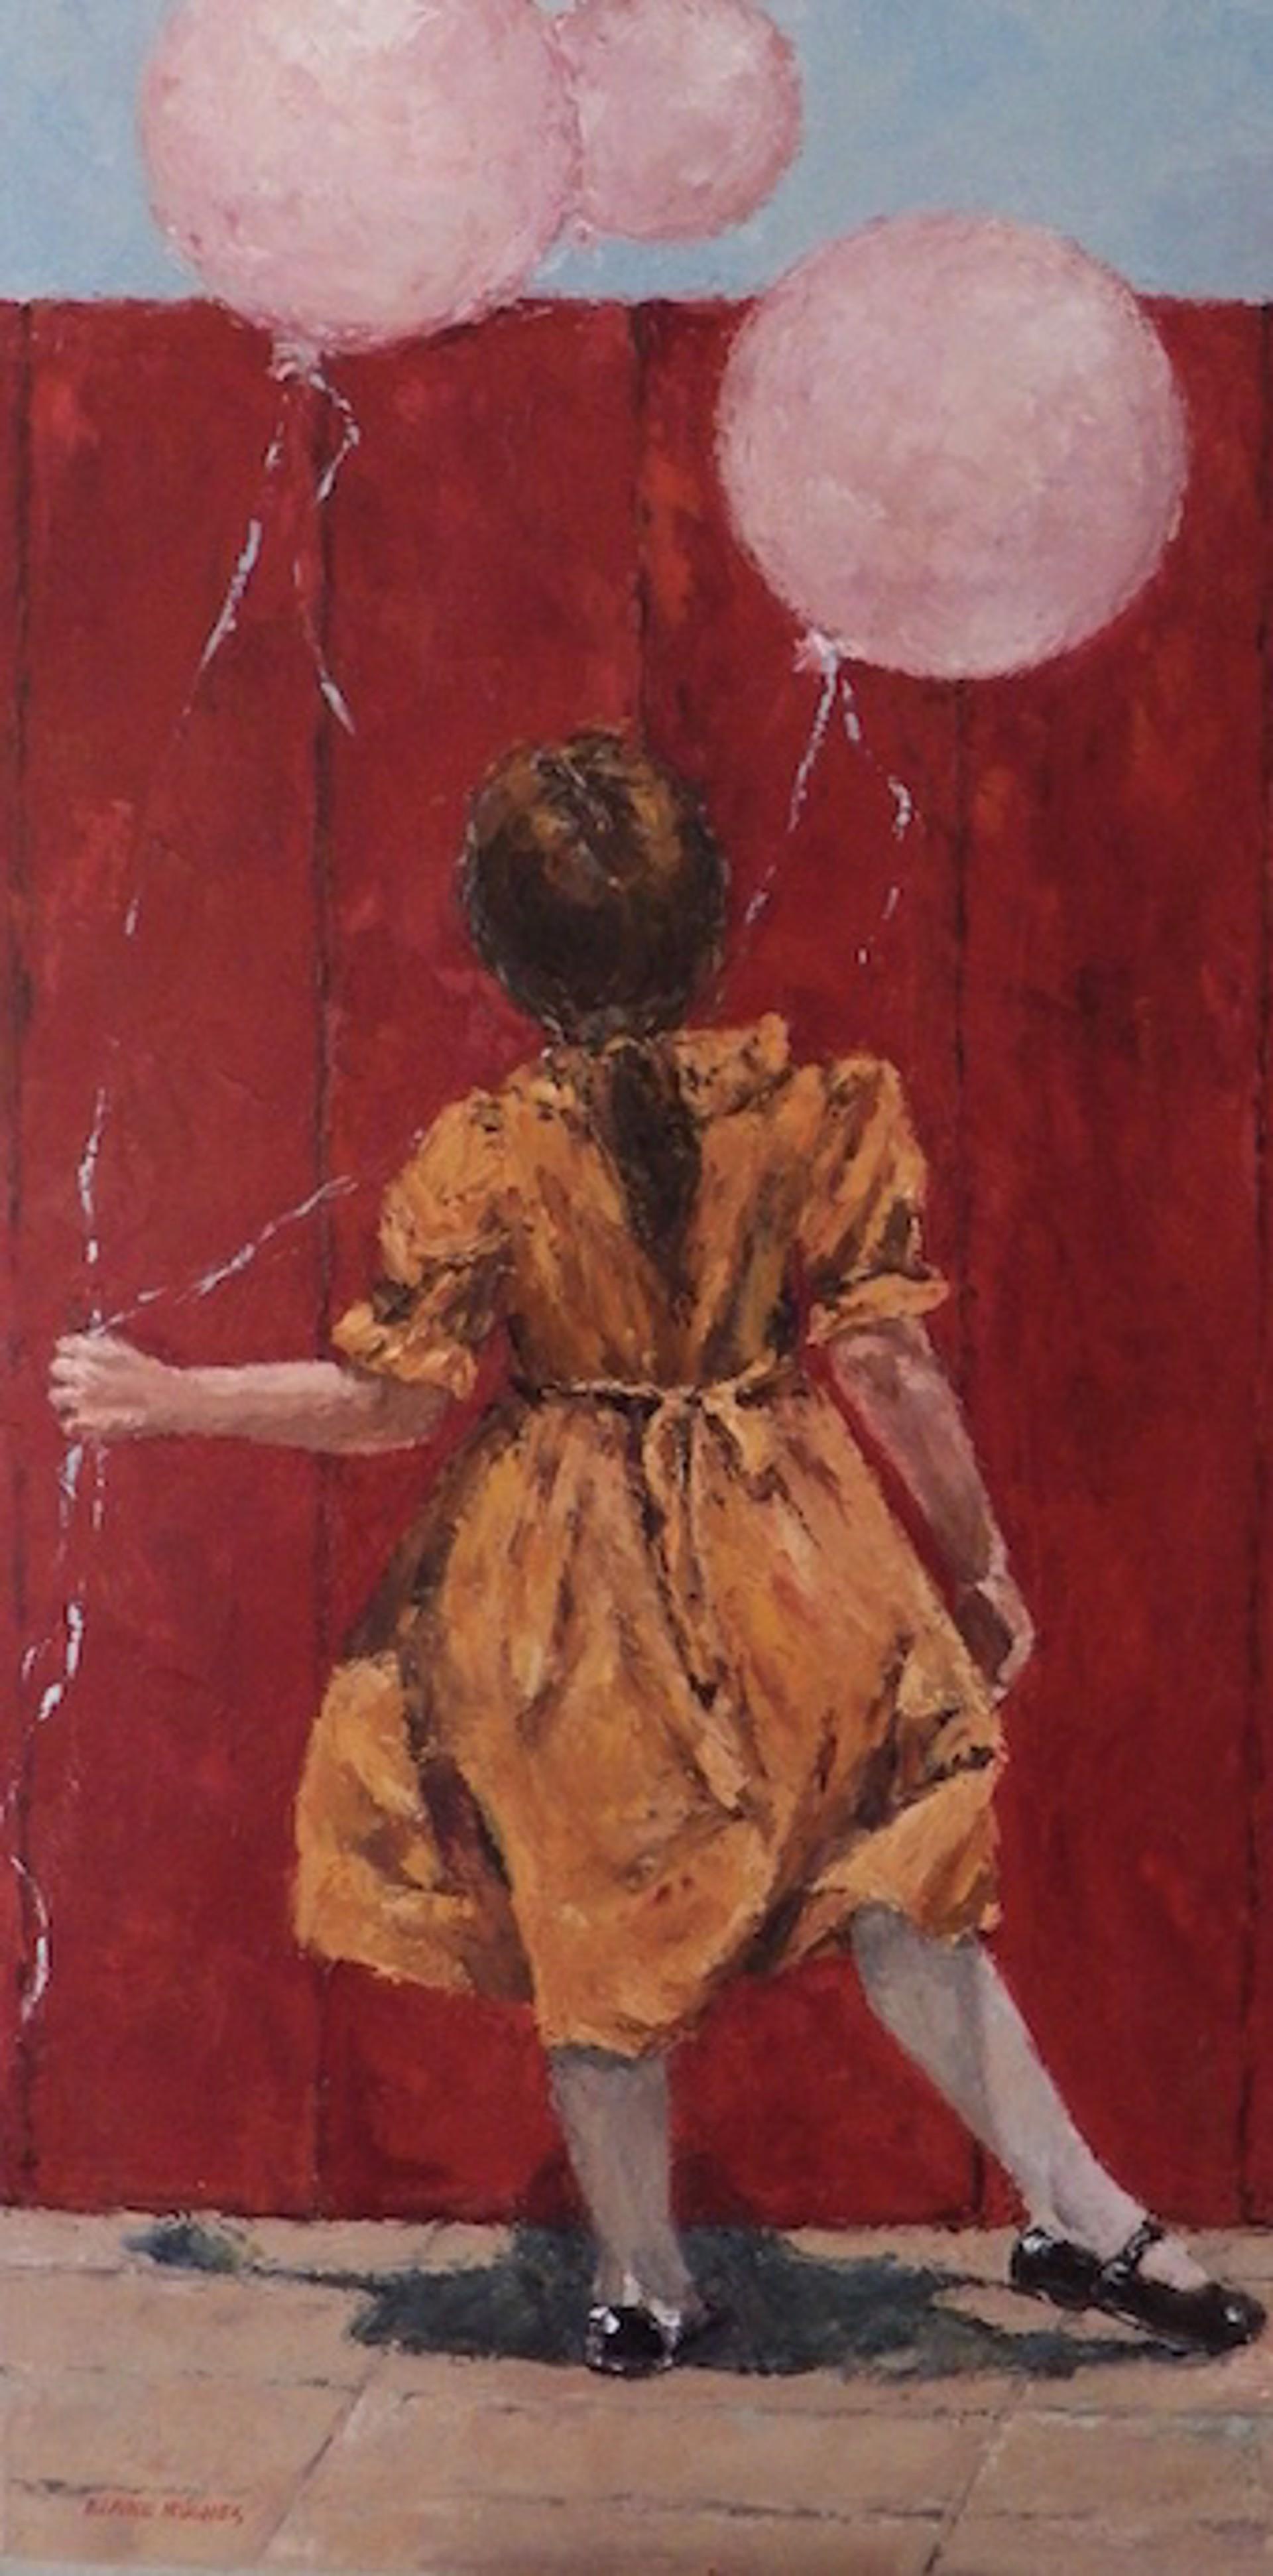 Soar by Elaine Hughes